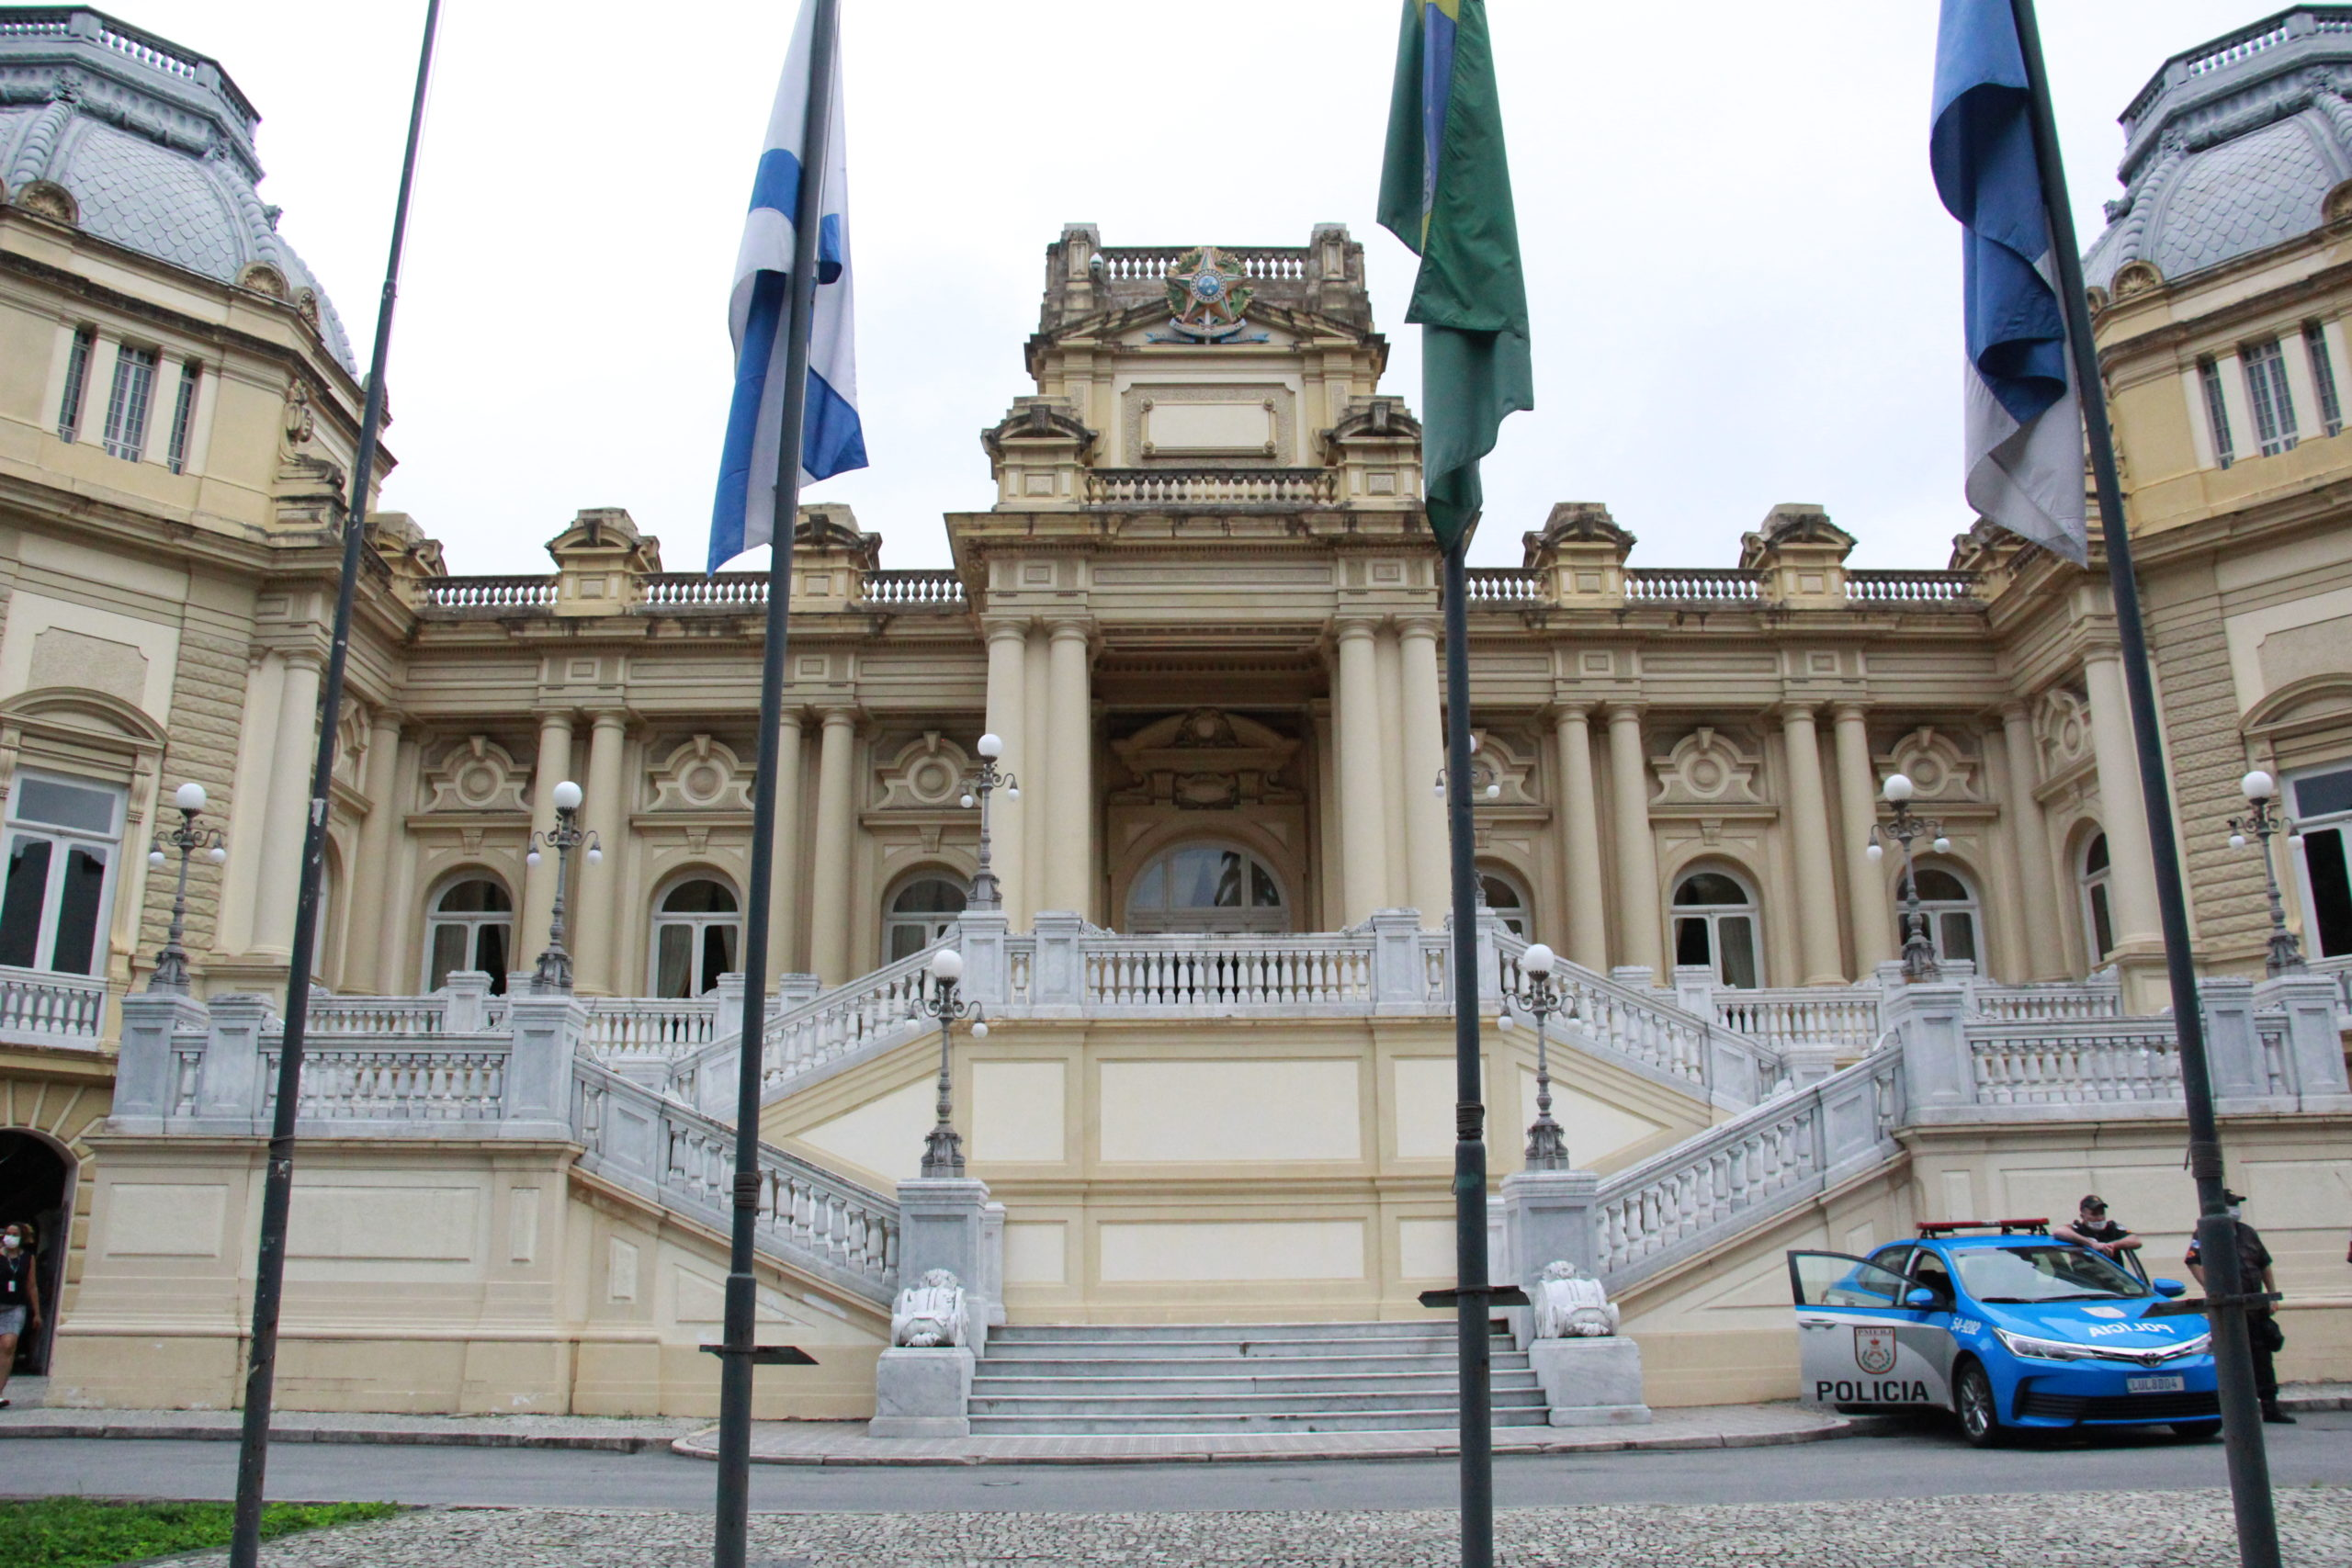 frente do Palácio Guanabara, no bairro das Laranjeiras